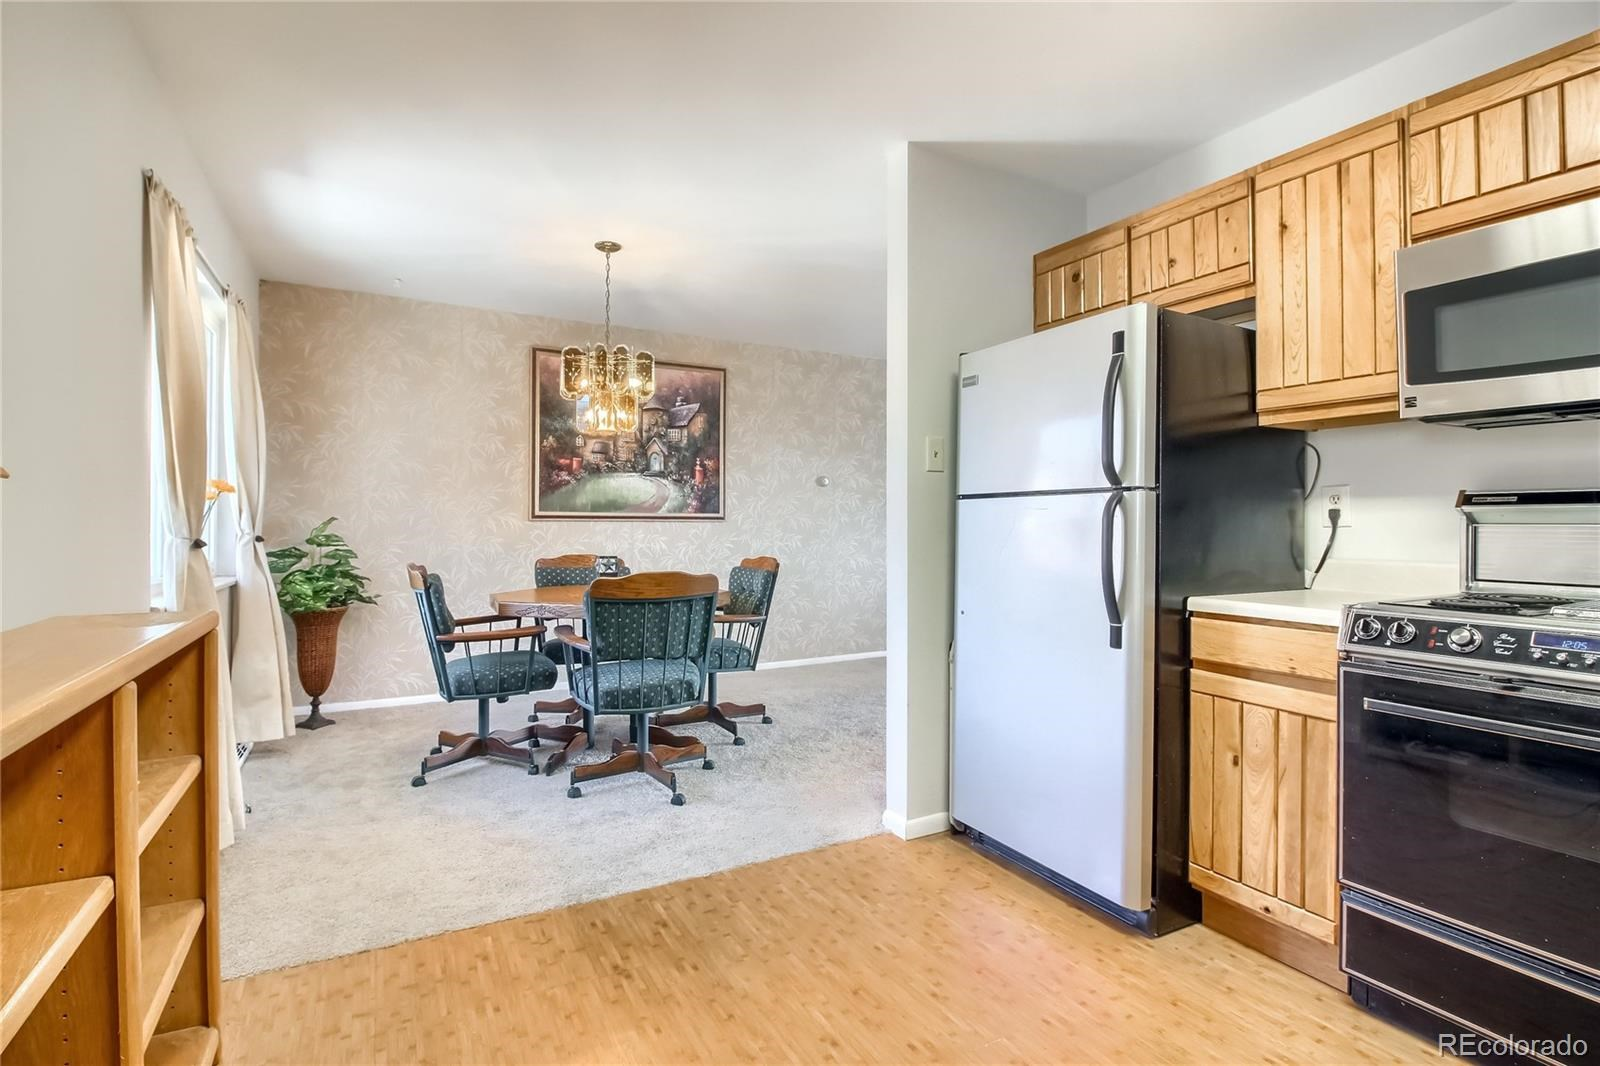 MLS# 7596382 - 11 - 1853 S Beech Street, Lakewood, CO 80228